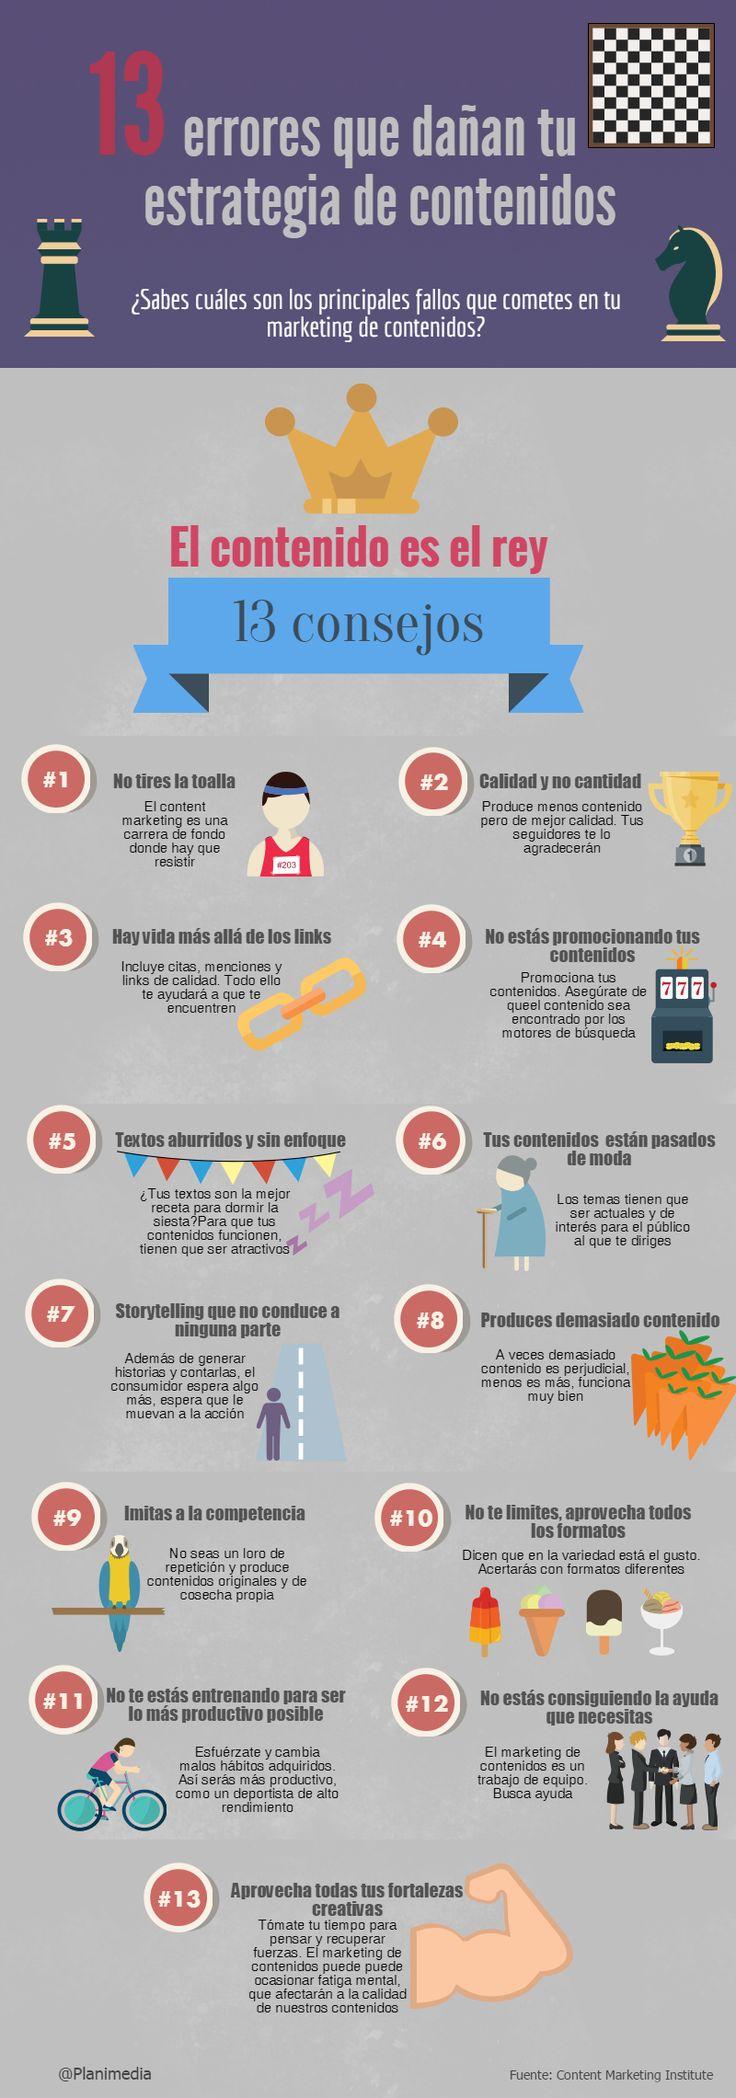 13 ERRORES QUE DAÑAN TU ESTRATEGIA DE CONTENIDOS #INFOGRAFIA #INFOGRAPHIC #MARKETING